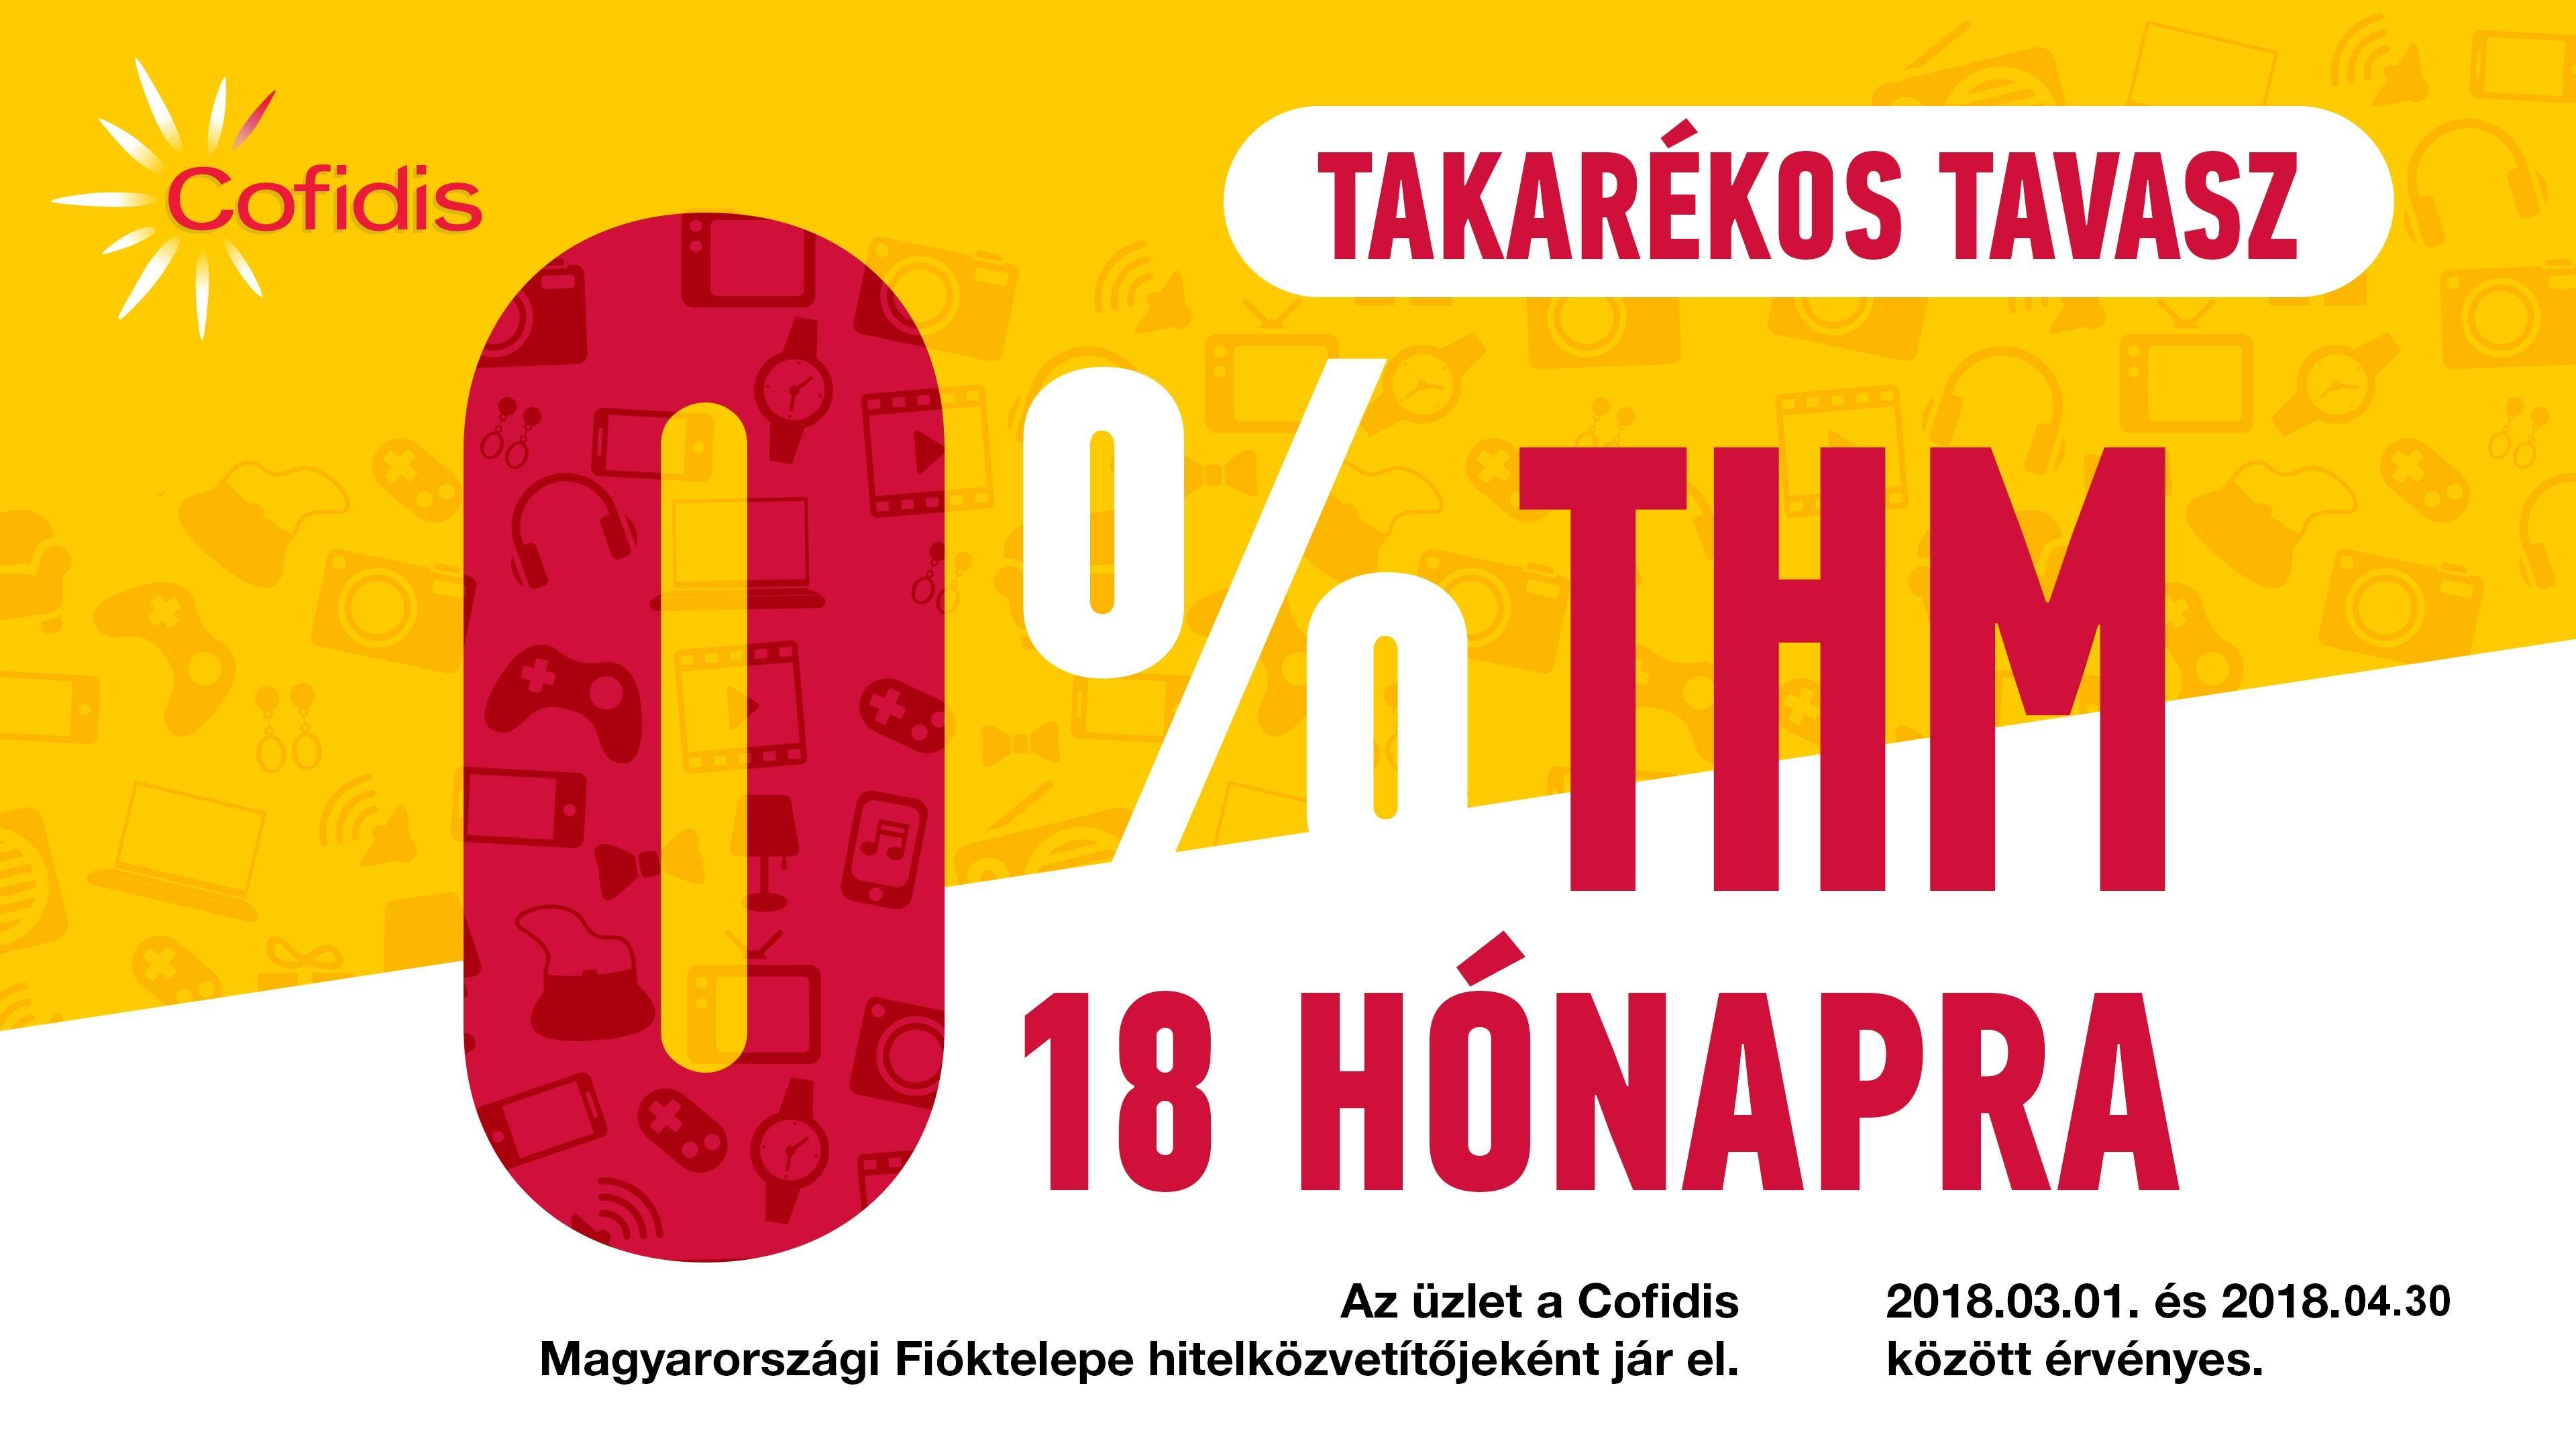 Cofidis 0% THM TAVASZI AKCIÓ